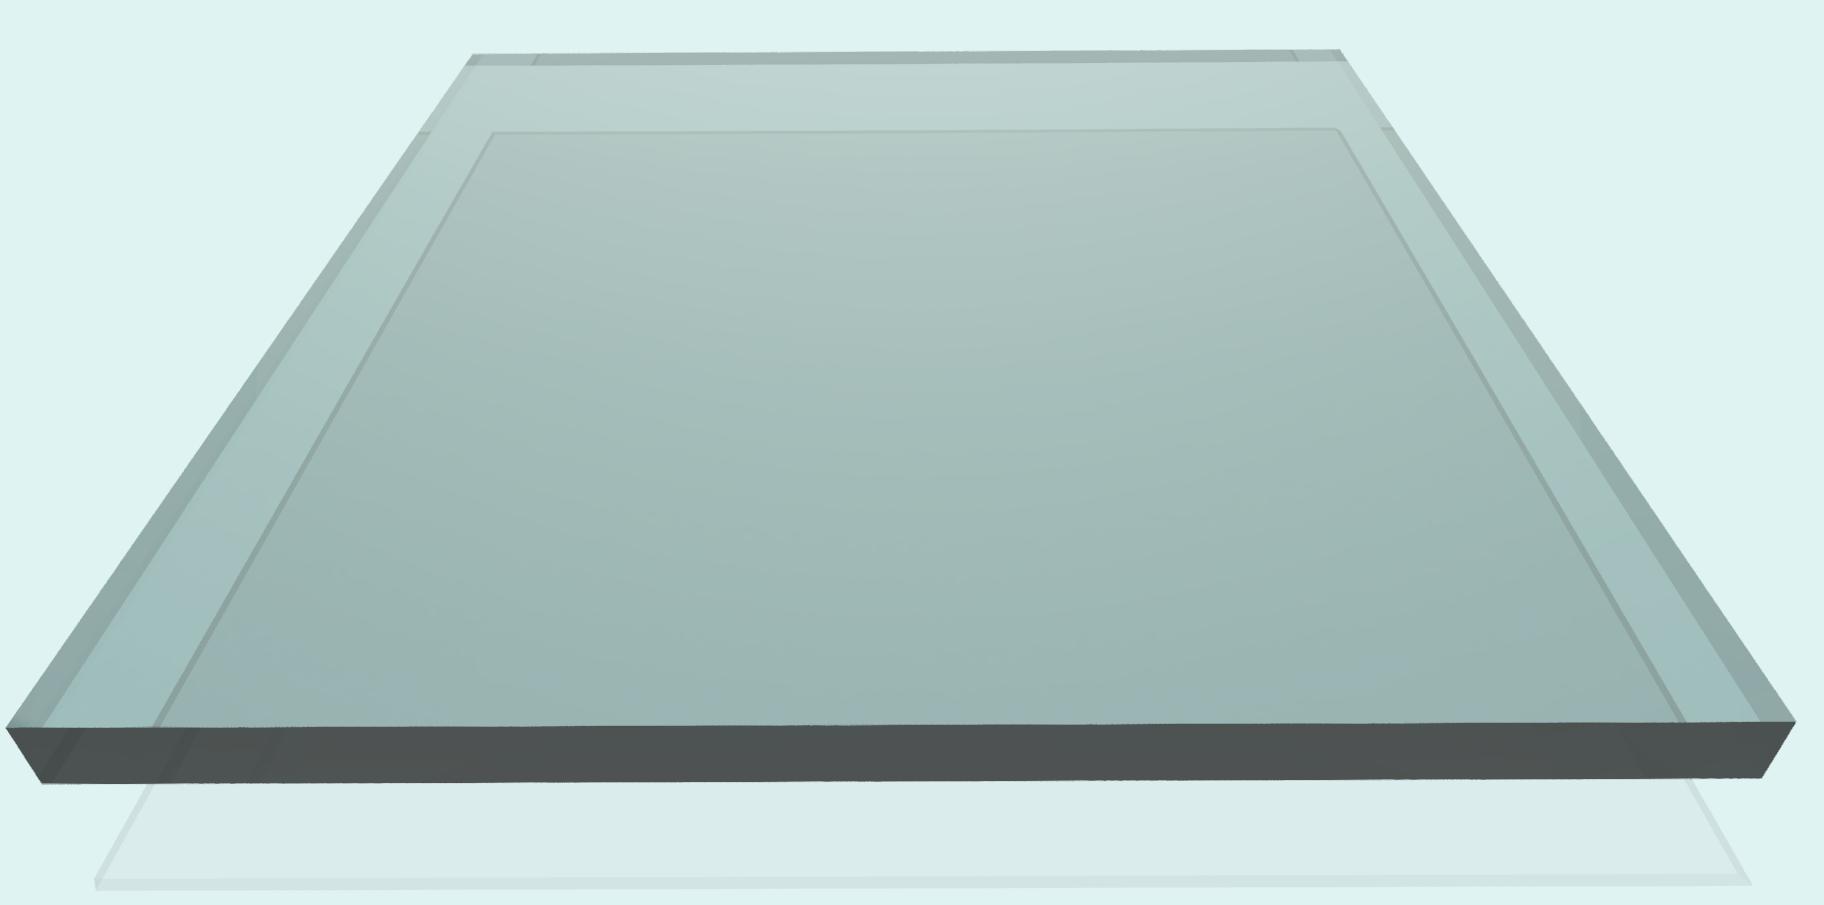 Plexiglas 10 mm , klar